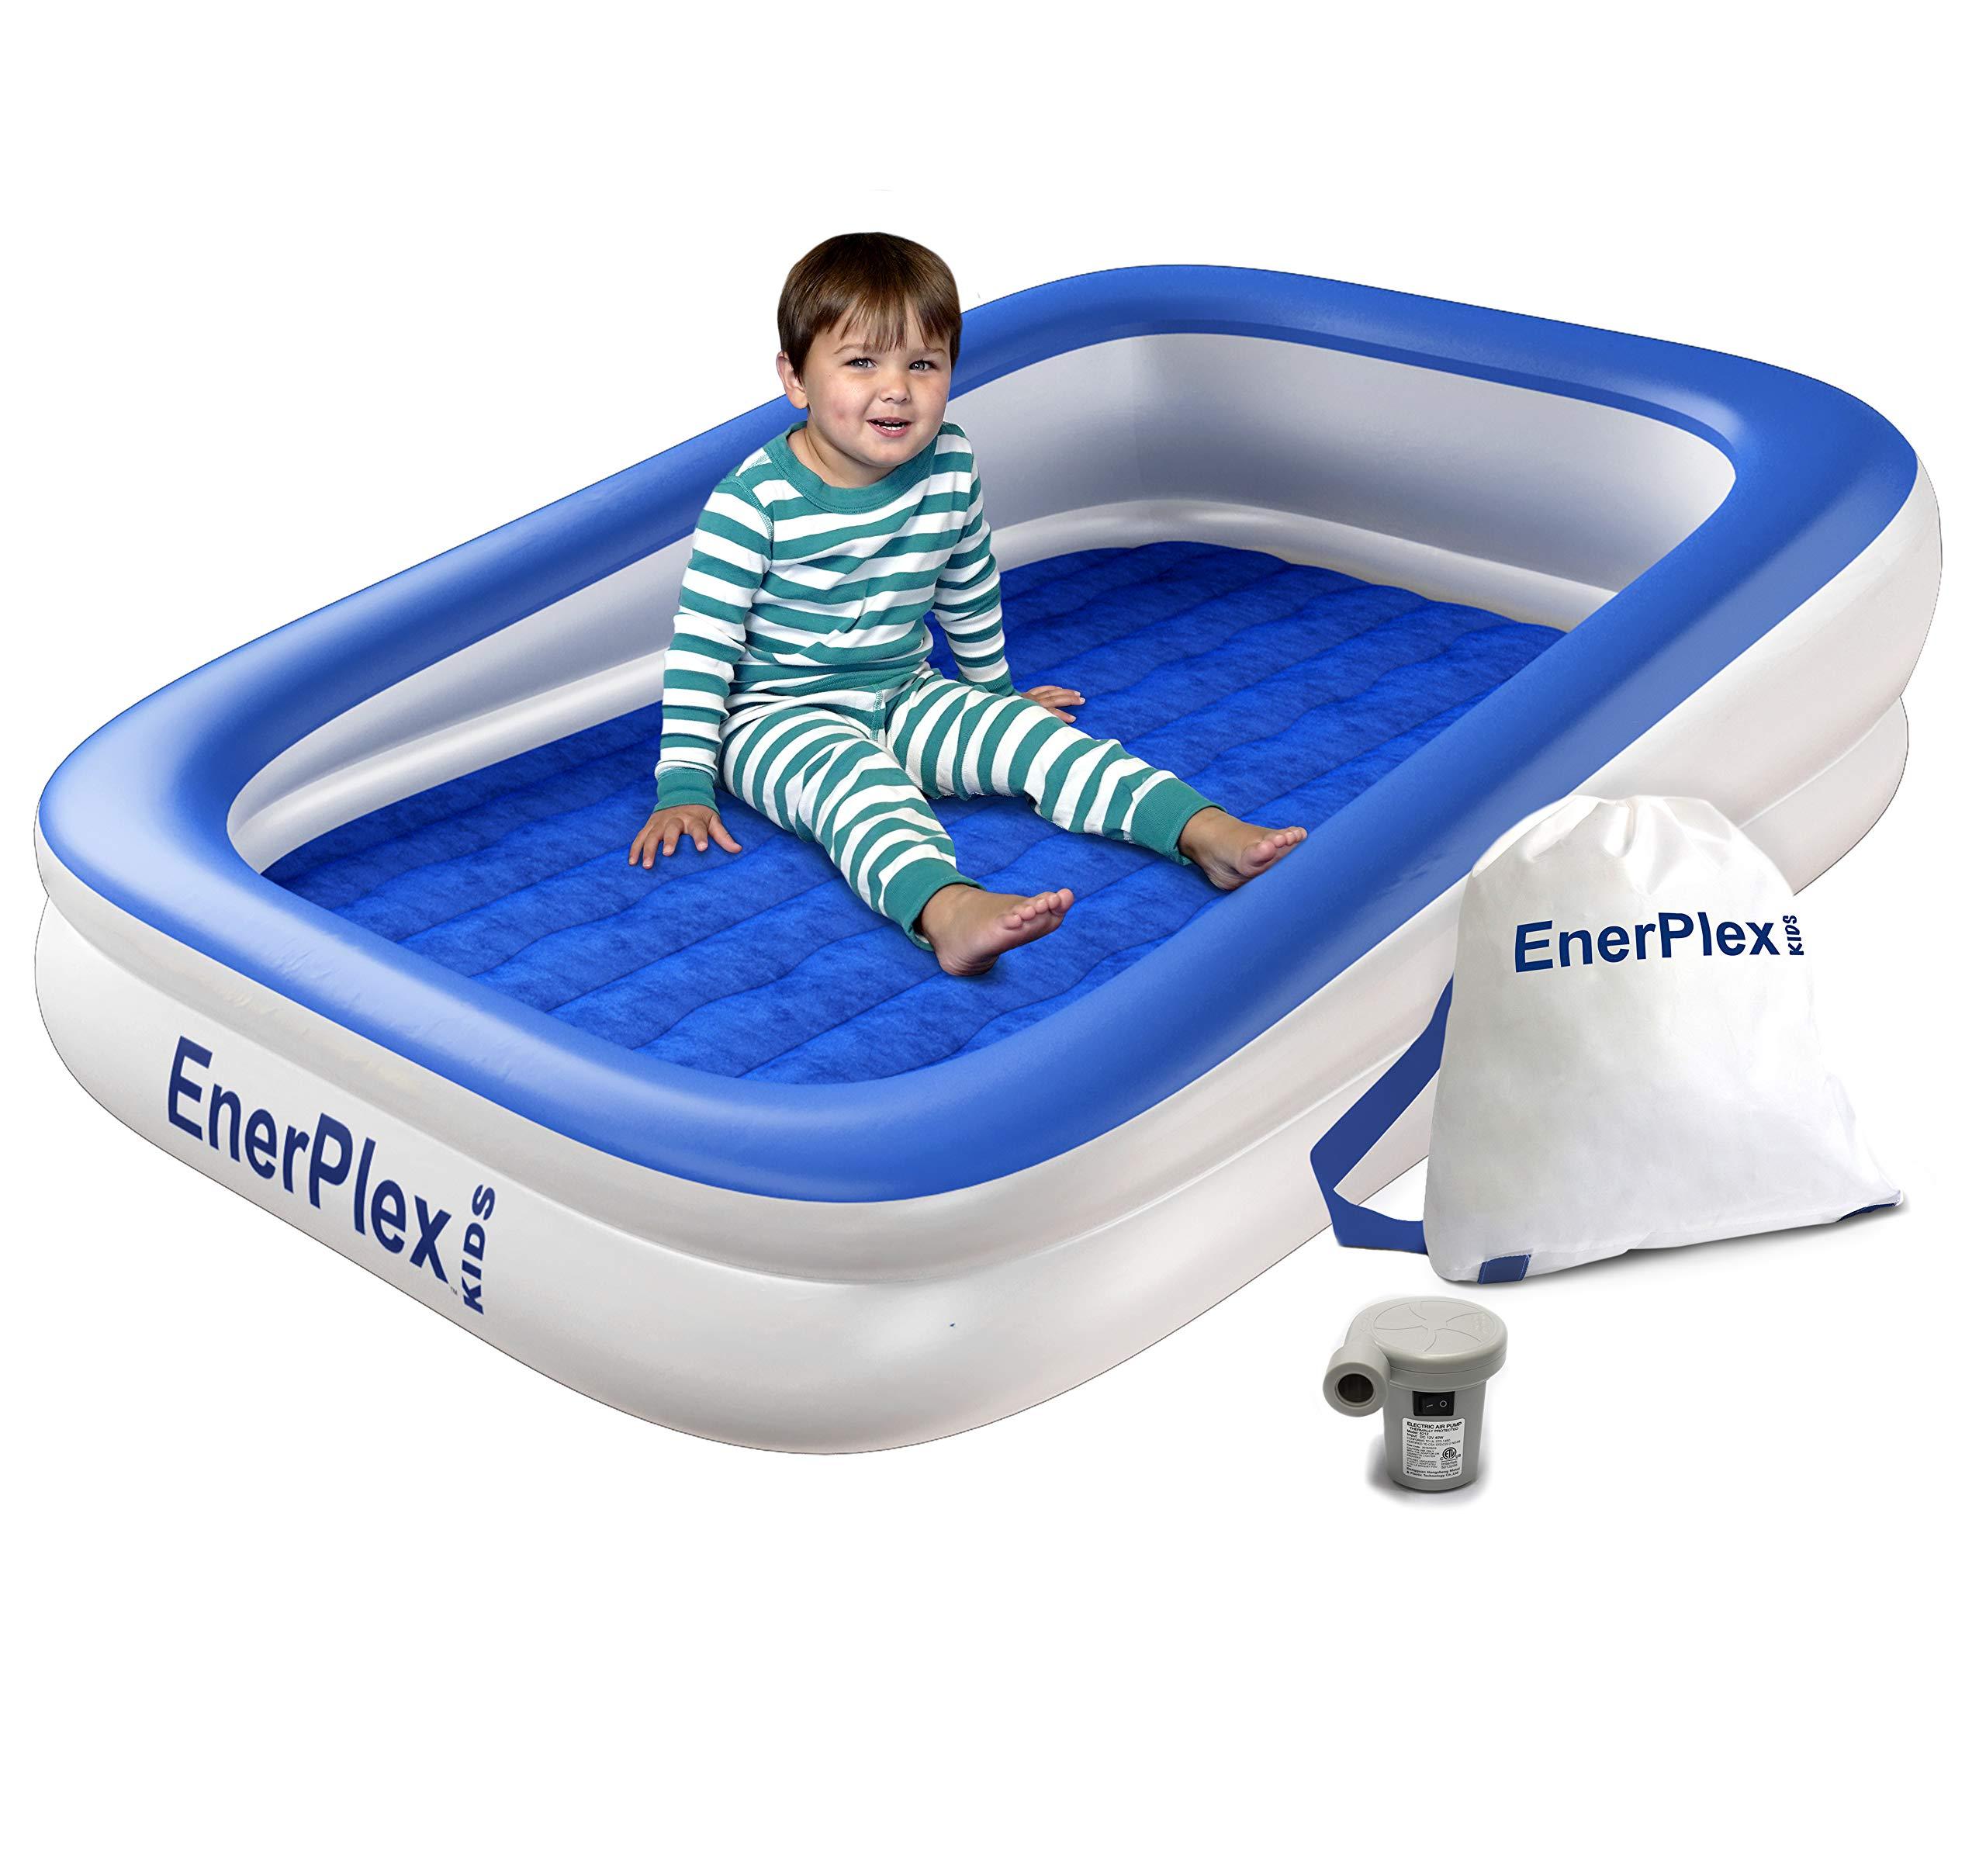 EnerPlex Inflatable Toddler Portable Mattress